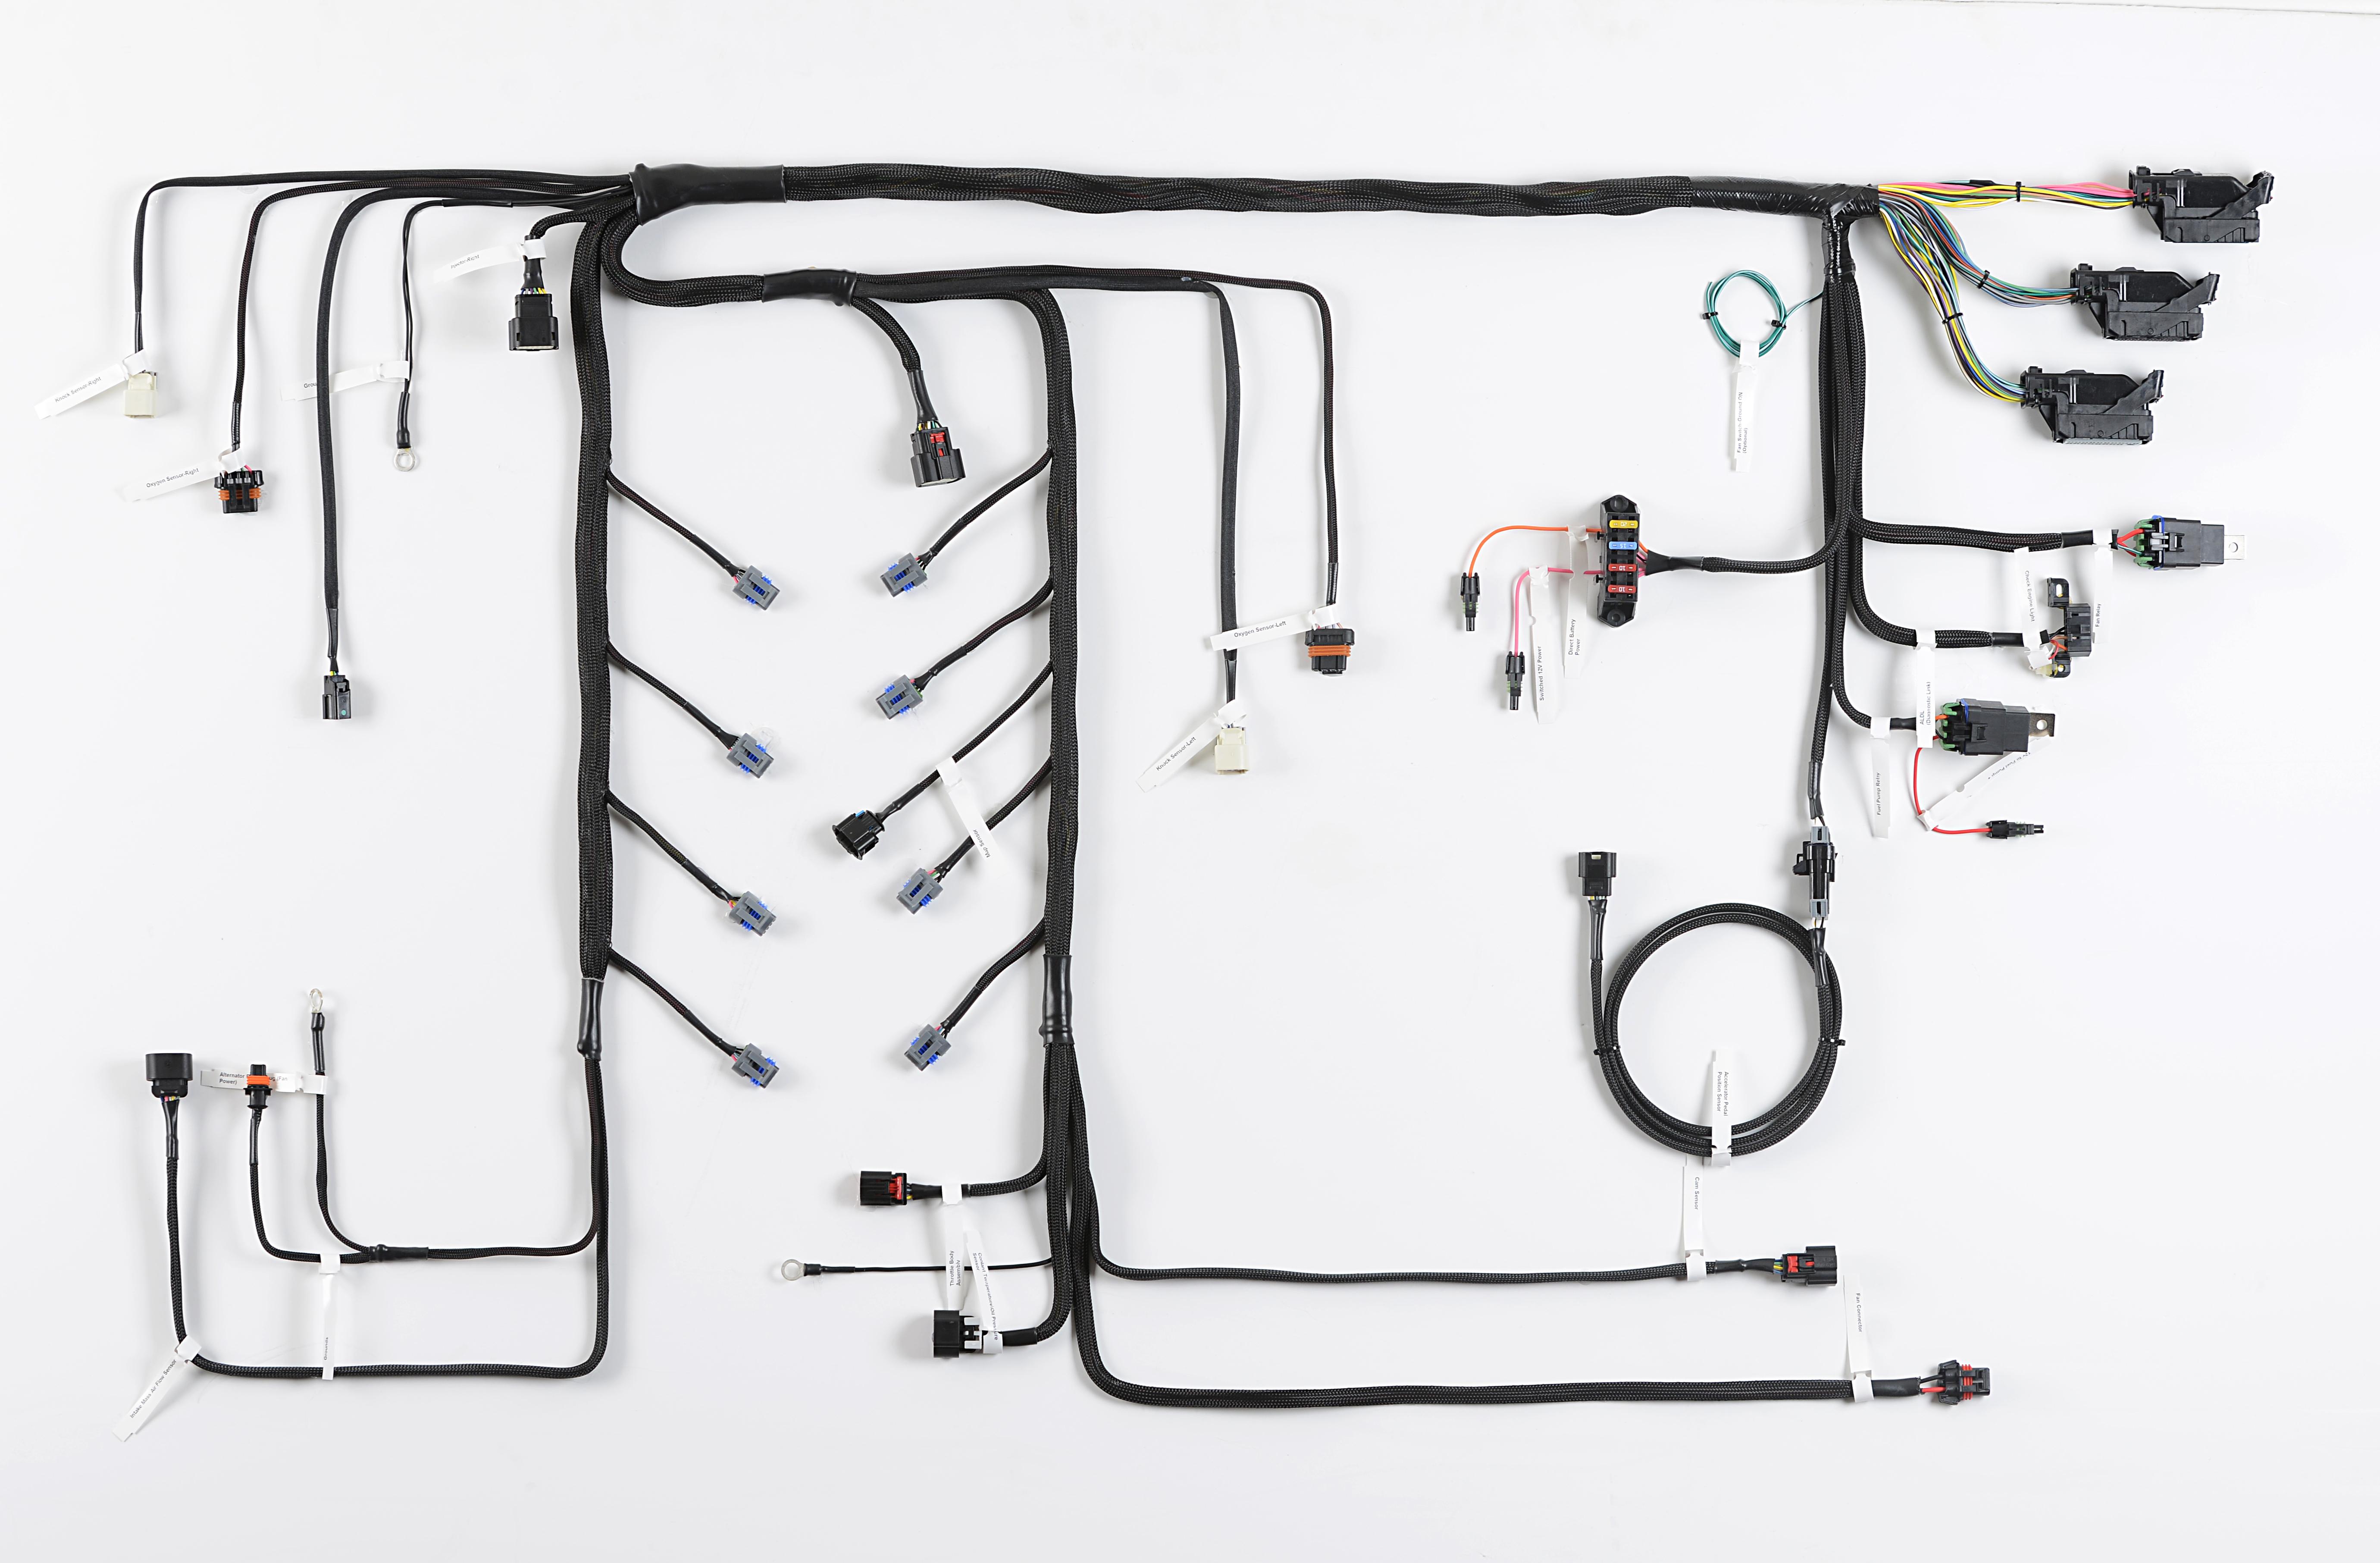 6l80 Transmission Wiring Harness | Wiring Liry on